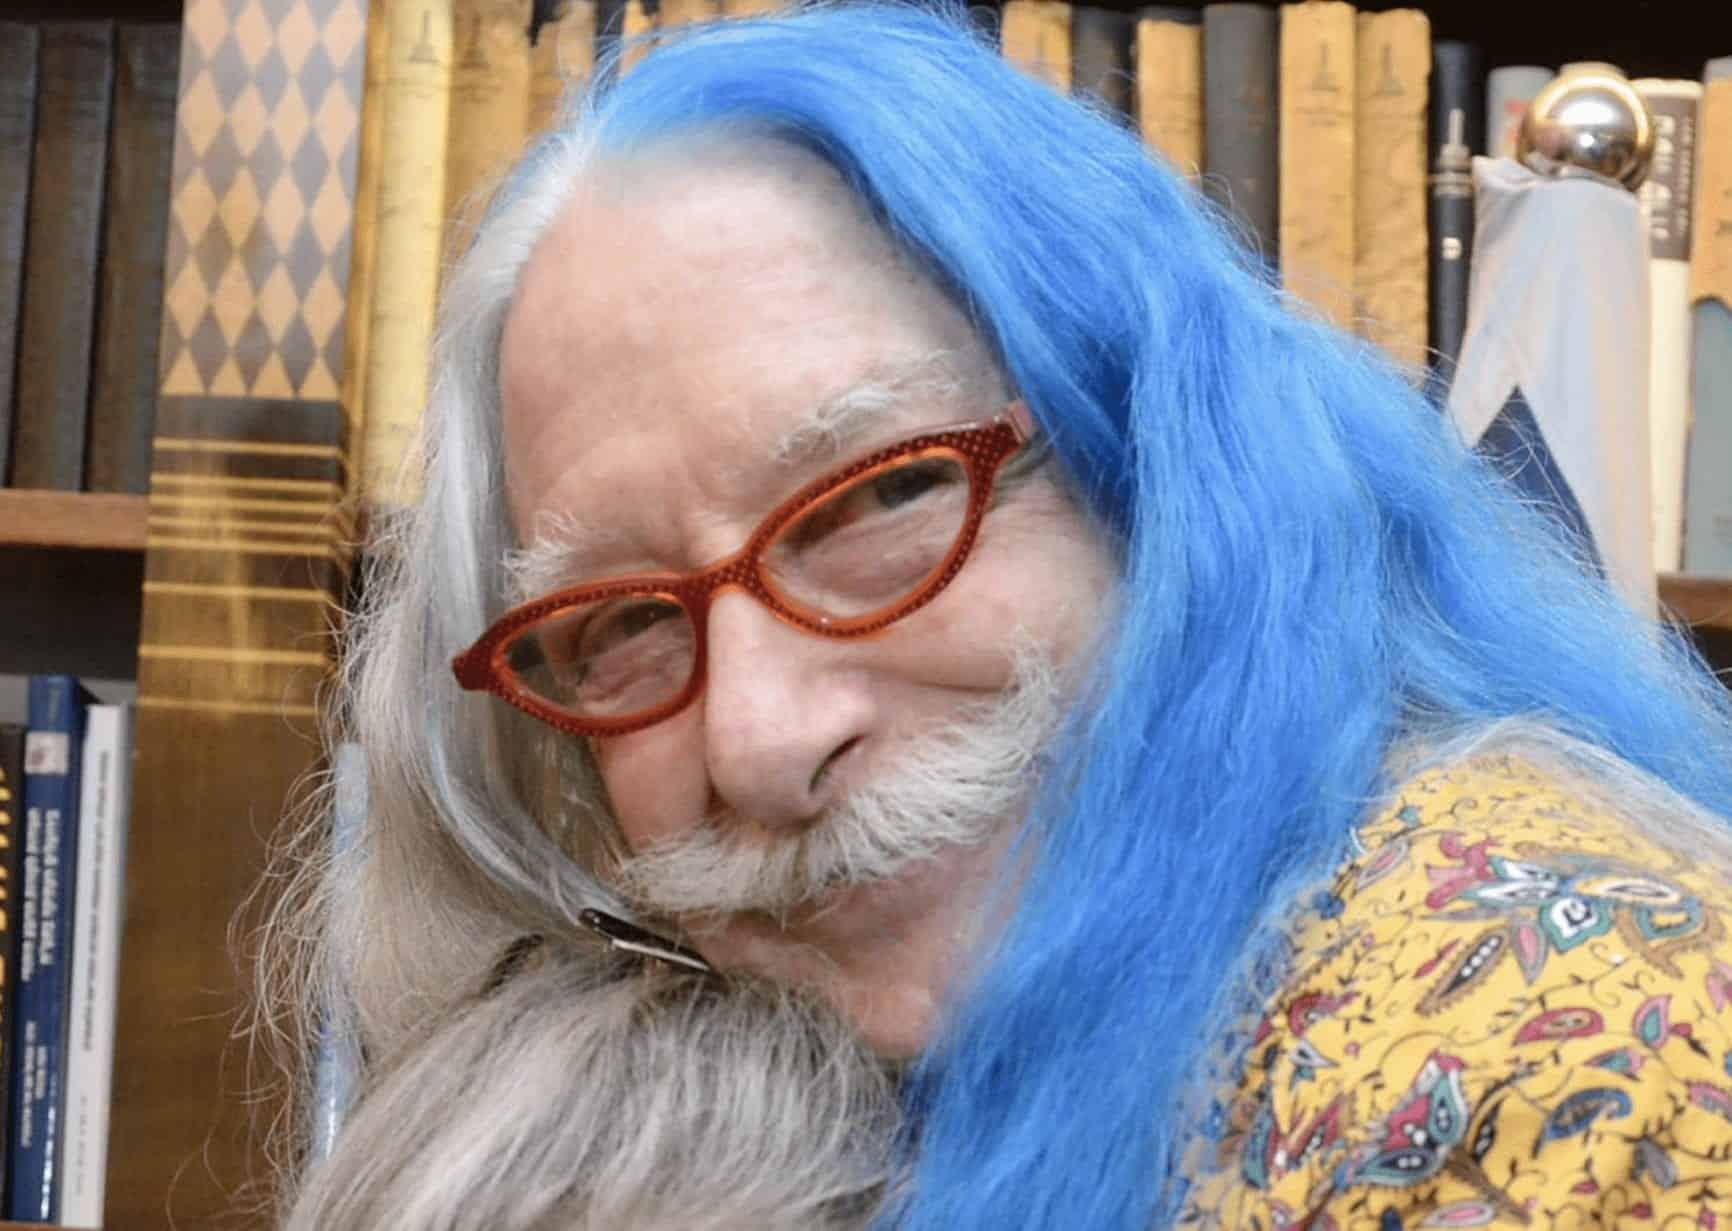 Stage clown Self-retorik - Influence Patch Adams